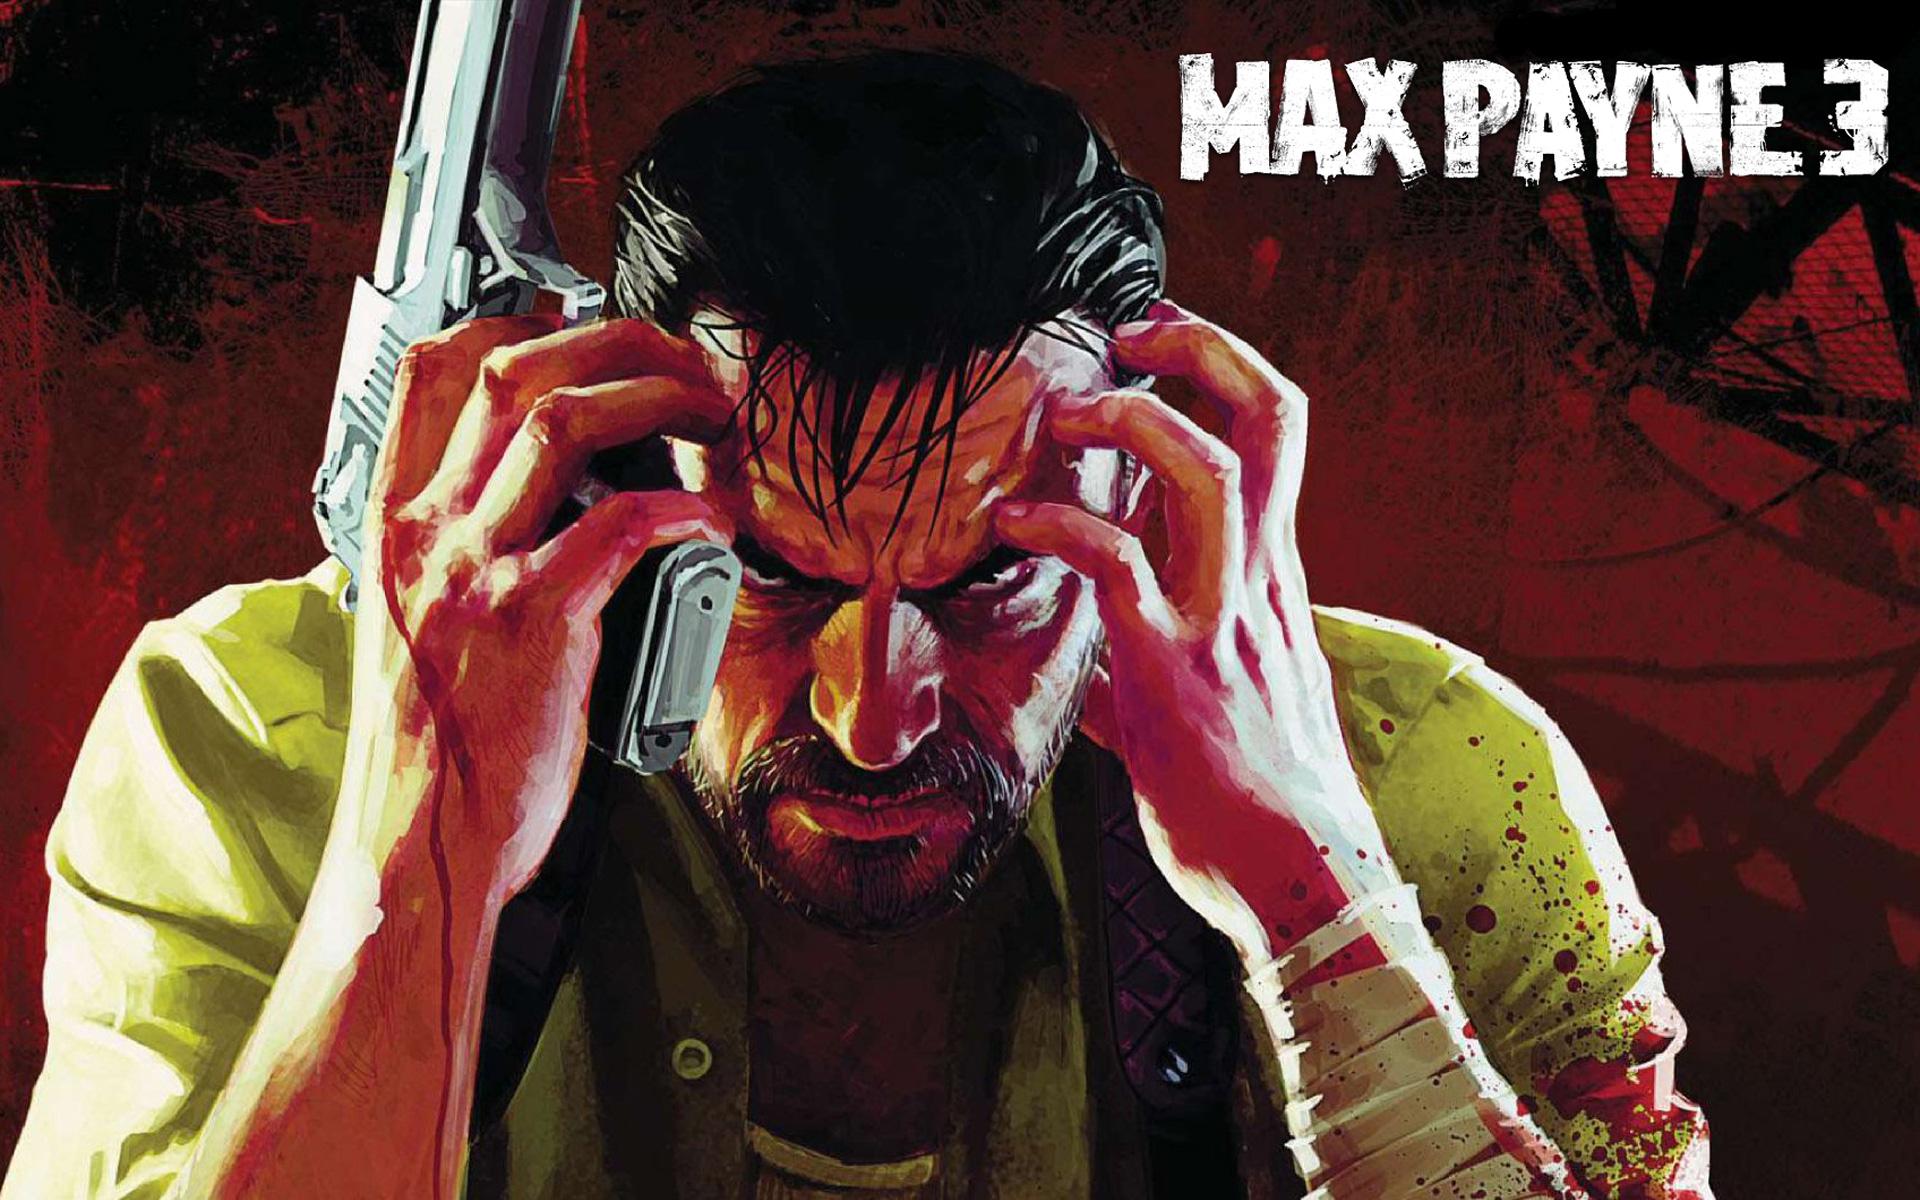 Max Payne 3 Wallpaper 1920x1080   wallpaper 1920x1200